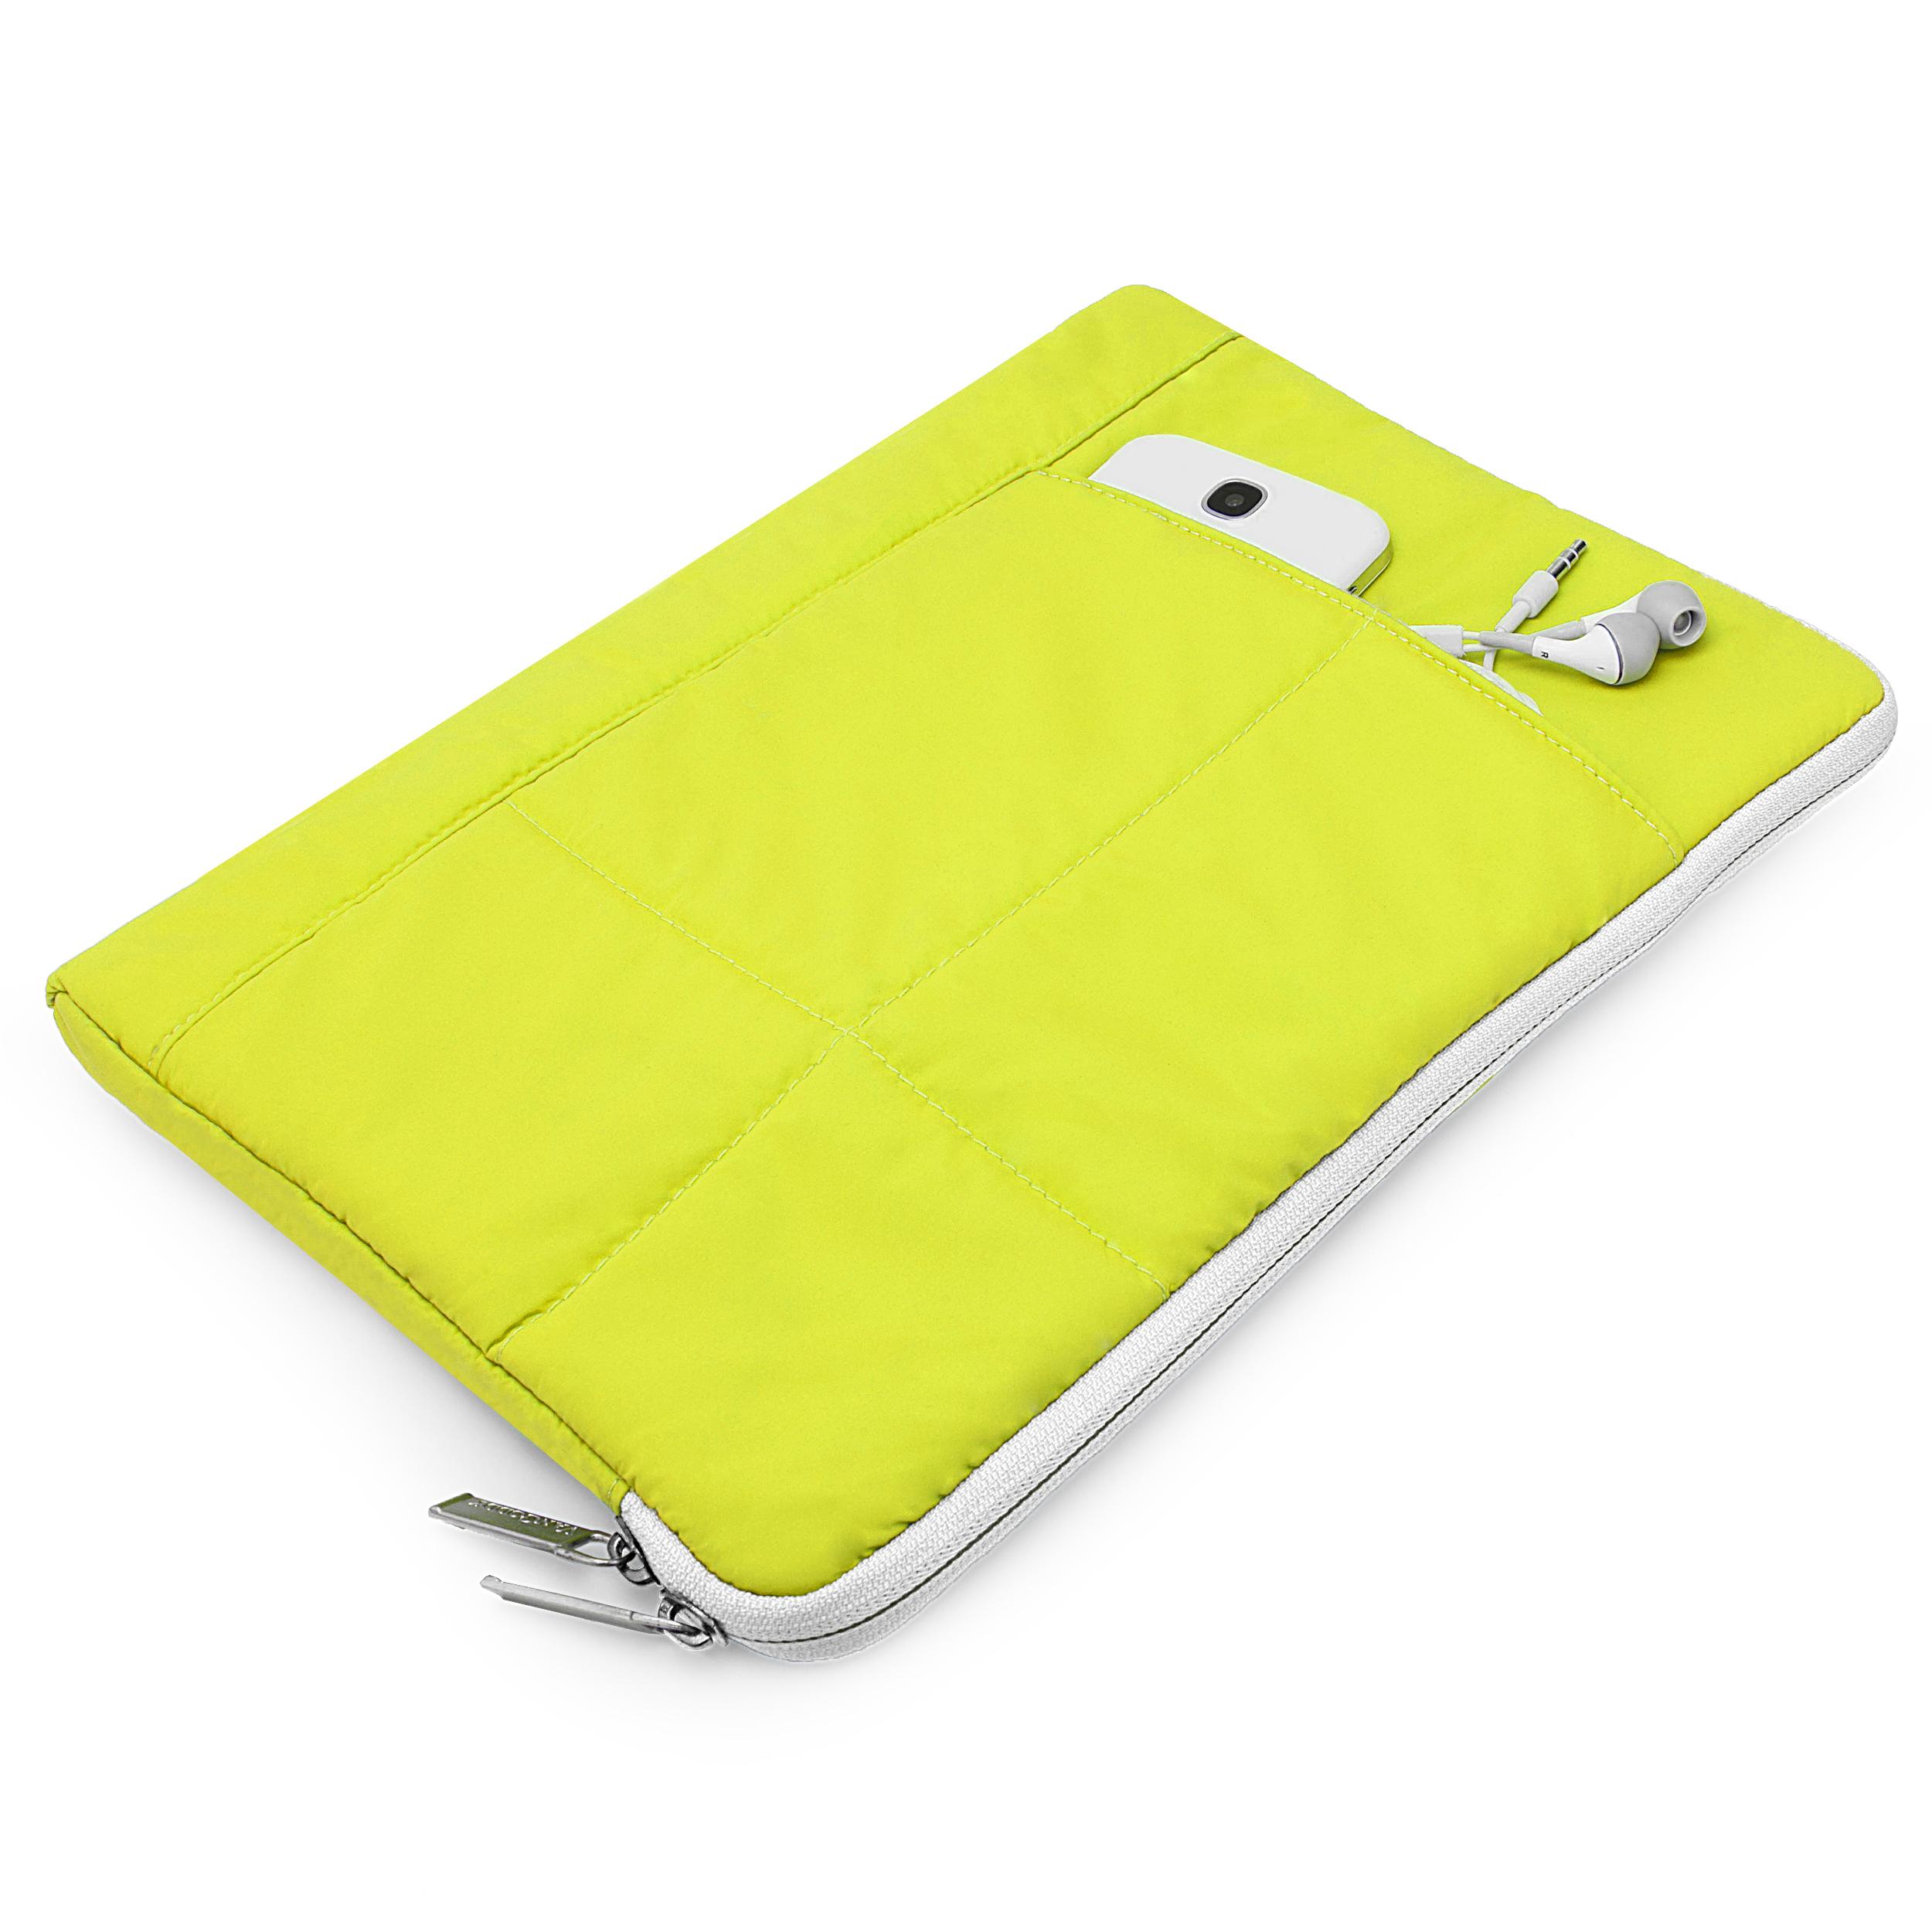 "Pillow Case 10"" (Lime/White)"